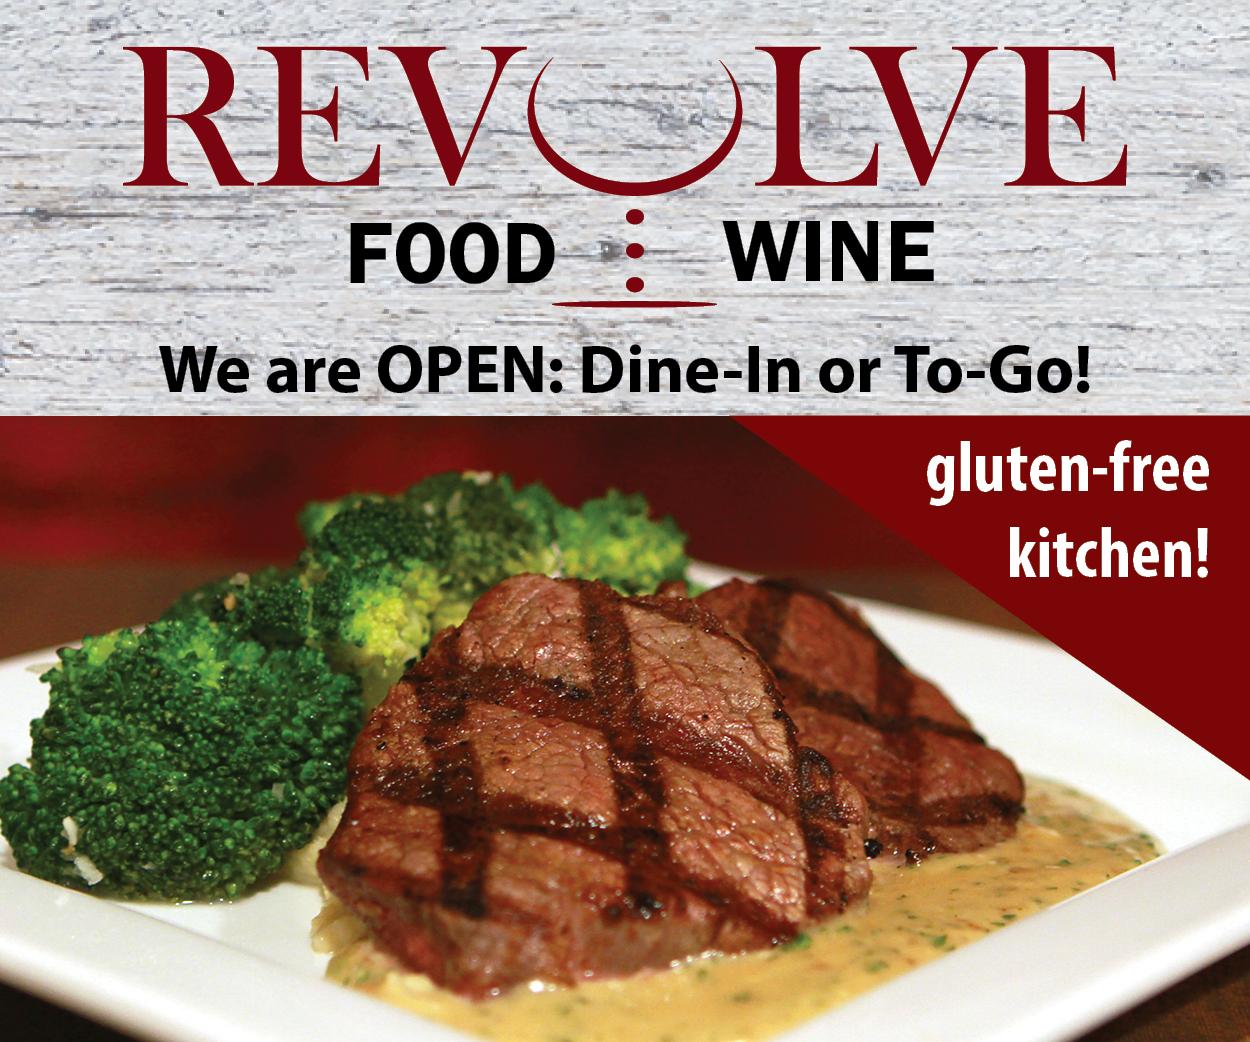 Revolve gluten free